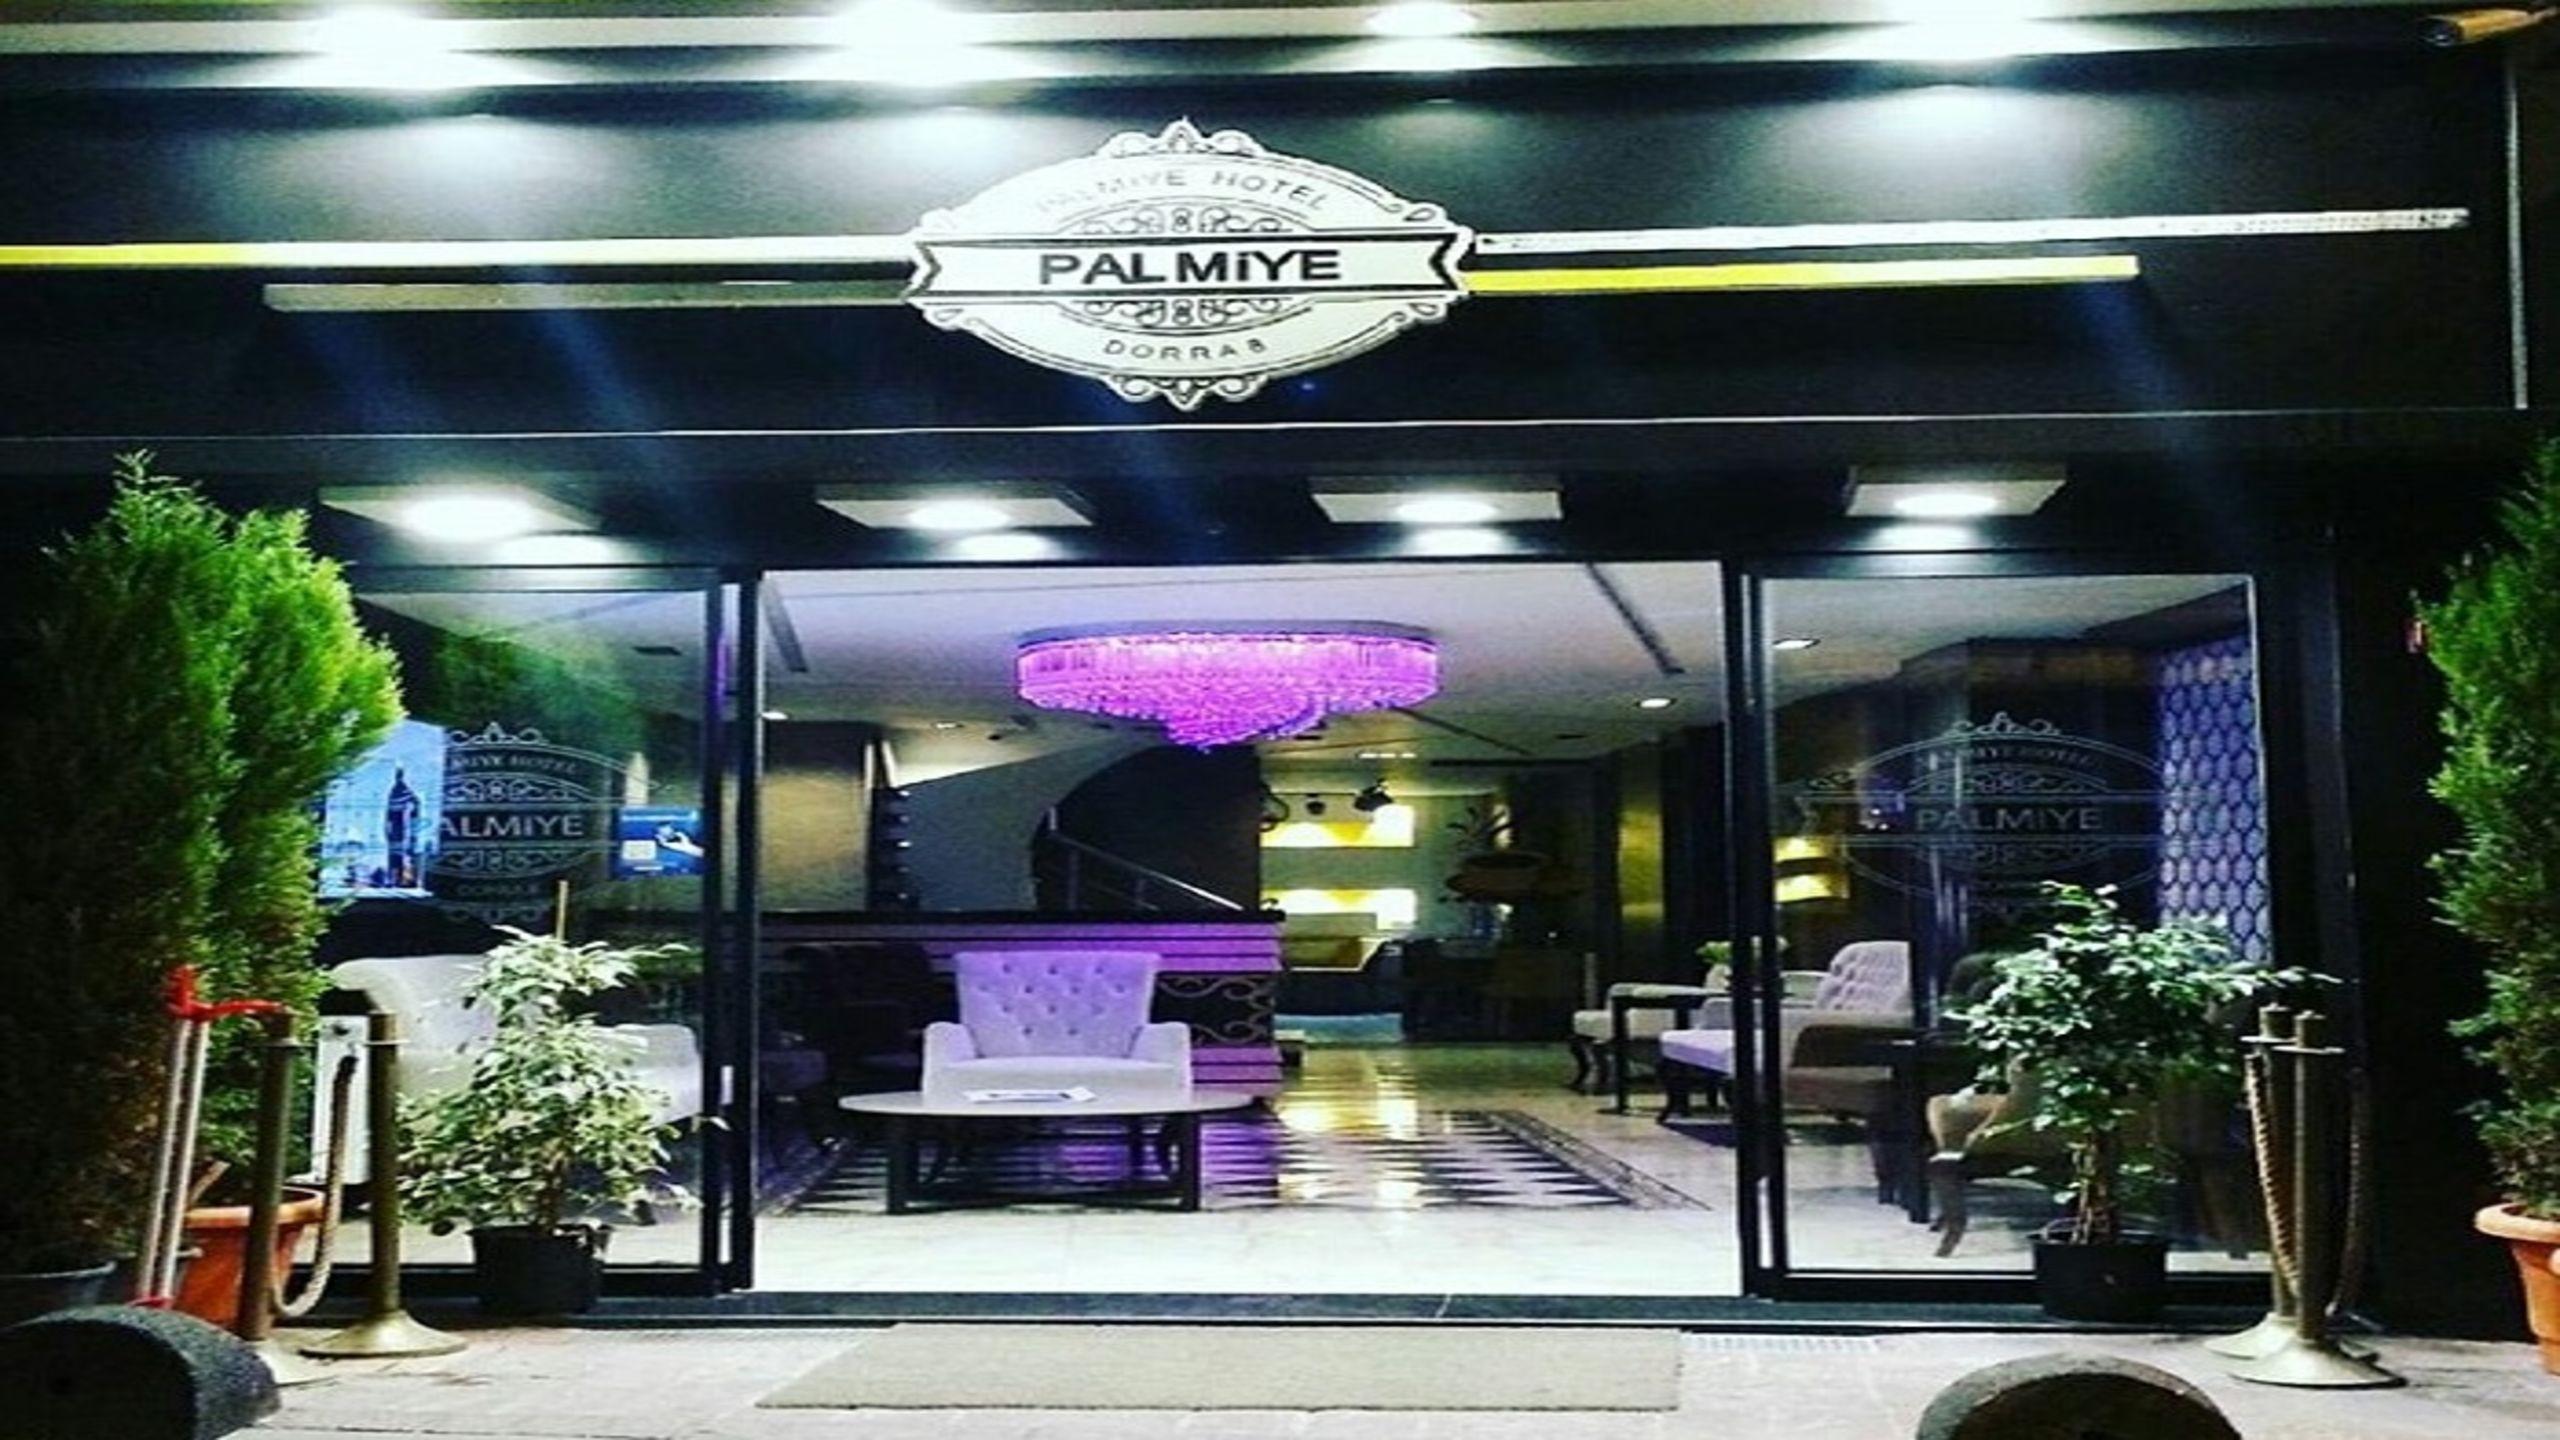 Palmiye Hotel Taksim